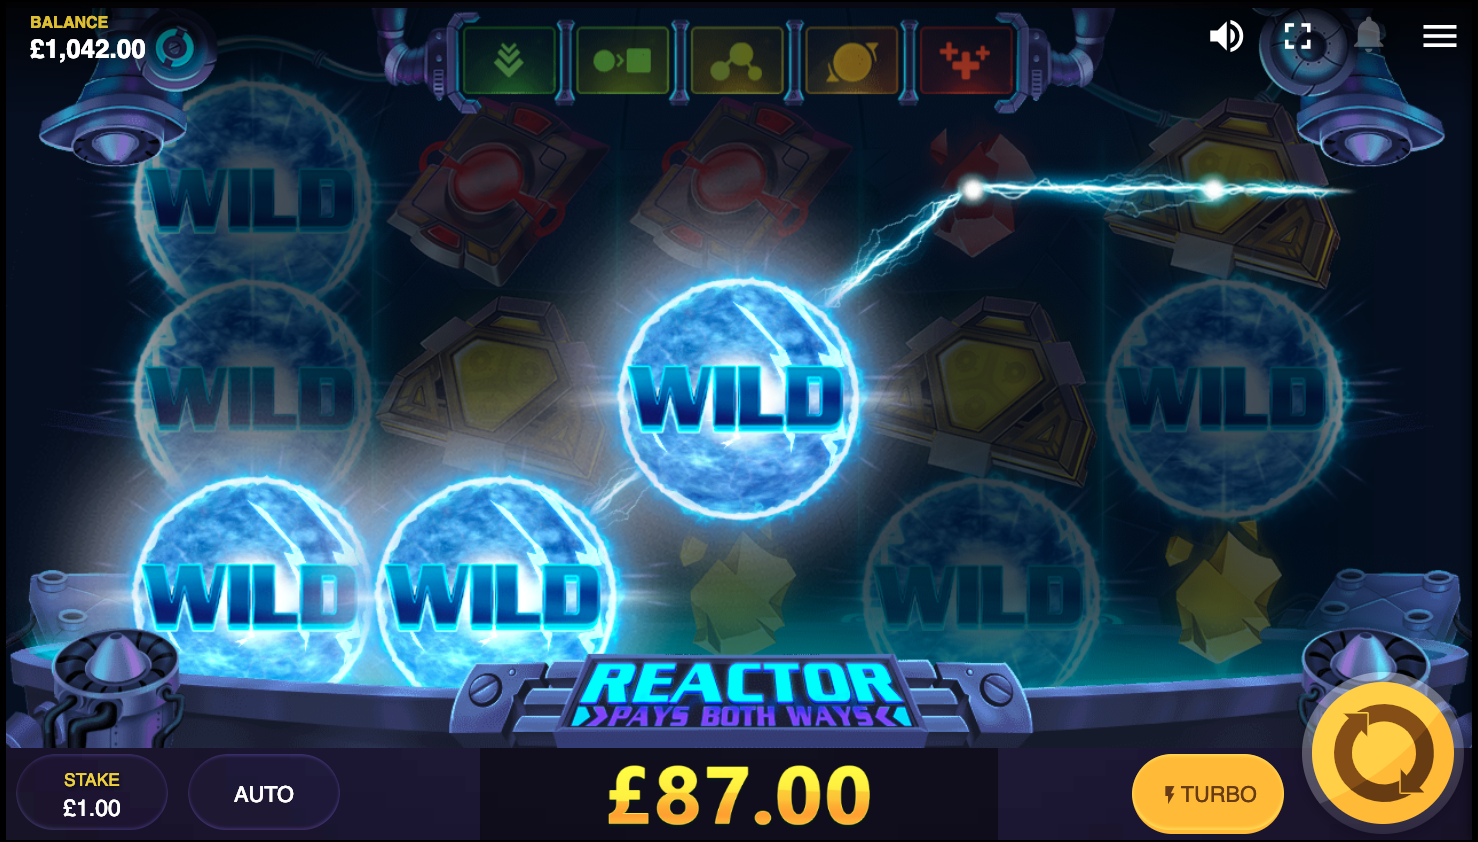 Reactor slot - 3 bonus features activated